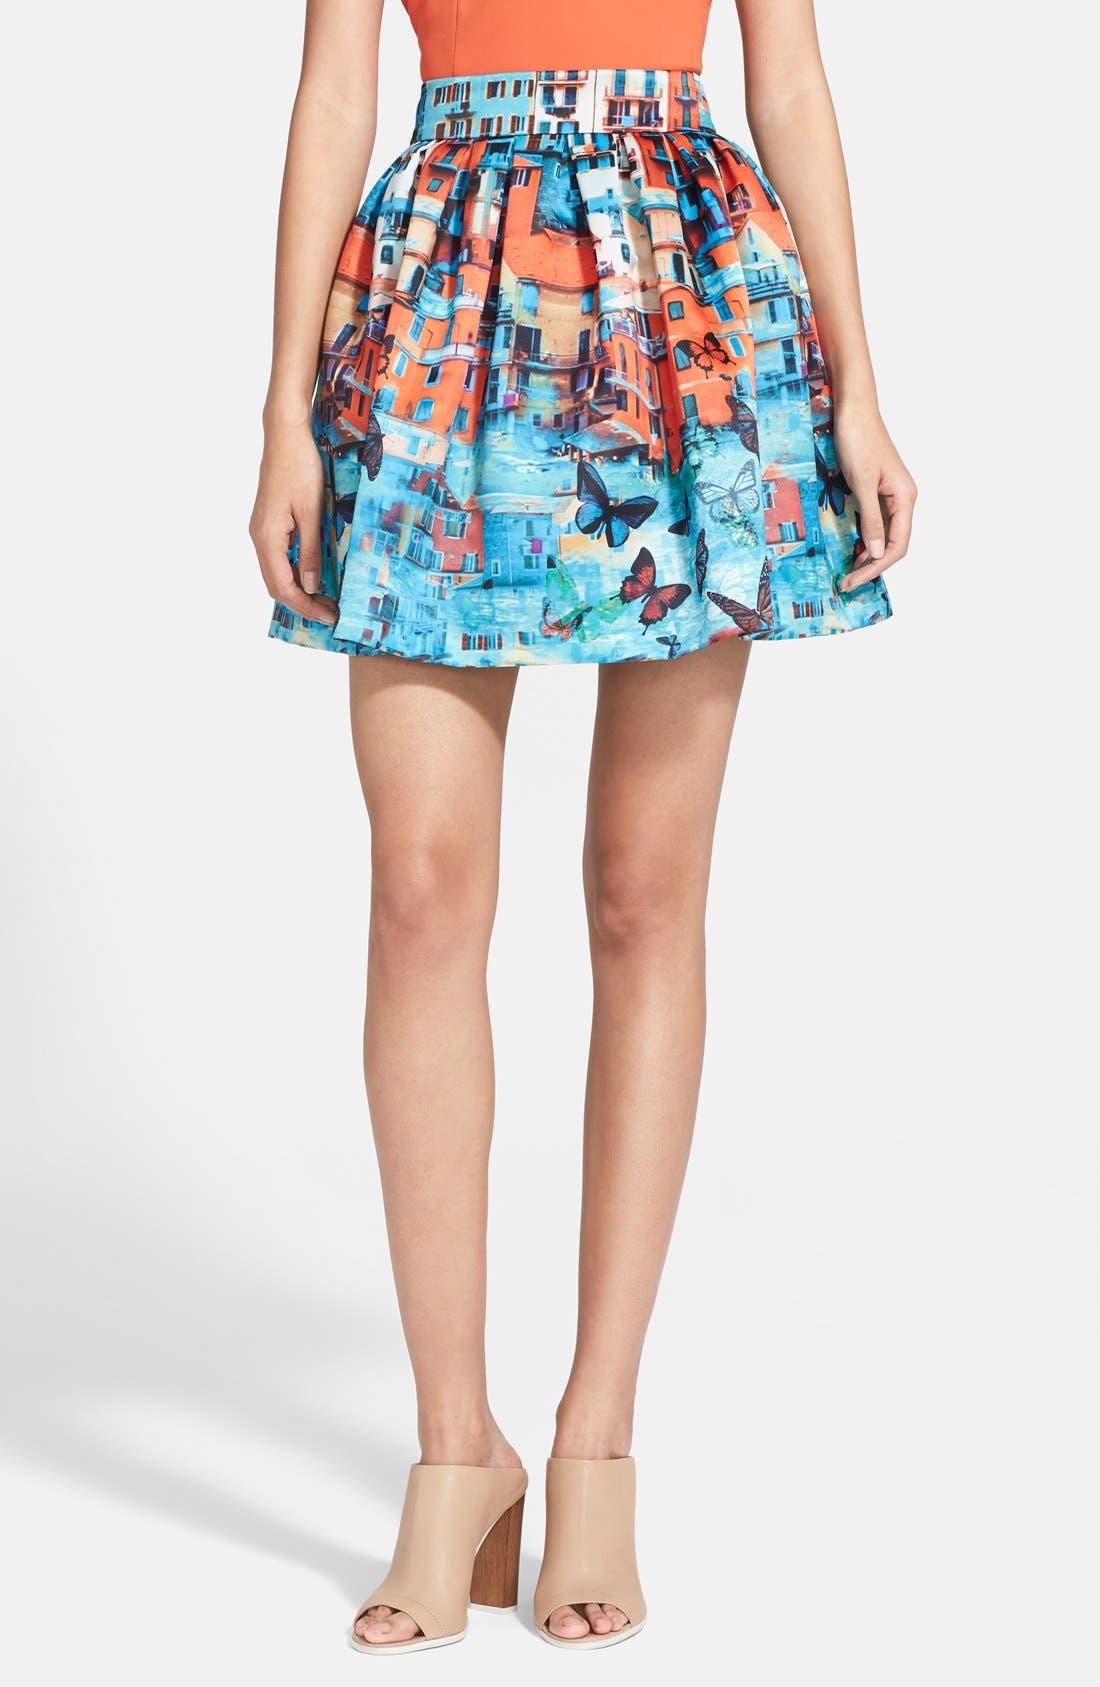 Alternate Image 1 Selected - Alice + Olivia 'Stora' Print Pouf Skirt